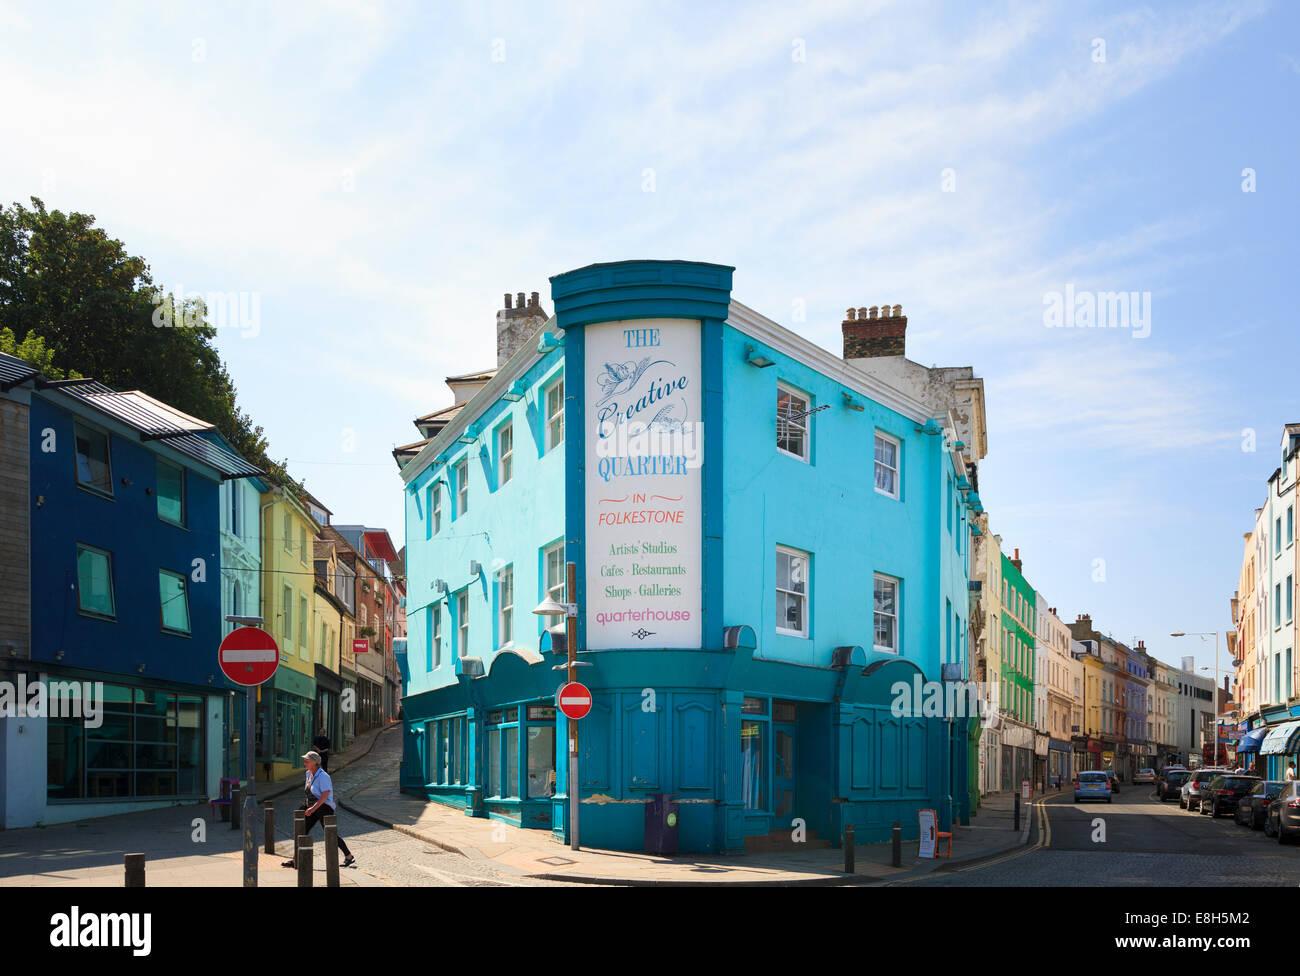 The Creative Quarter in old Folkestone. - Stock Image